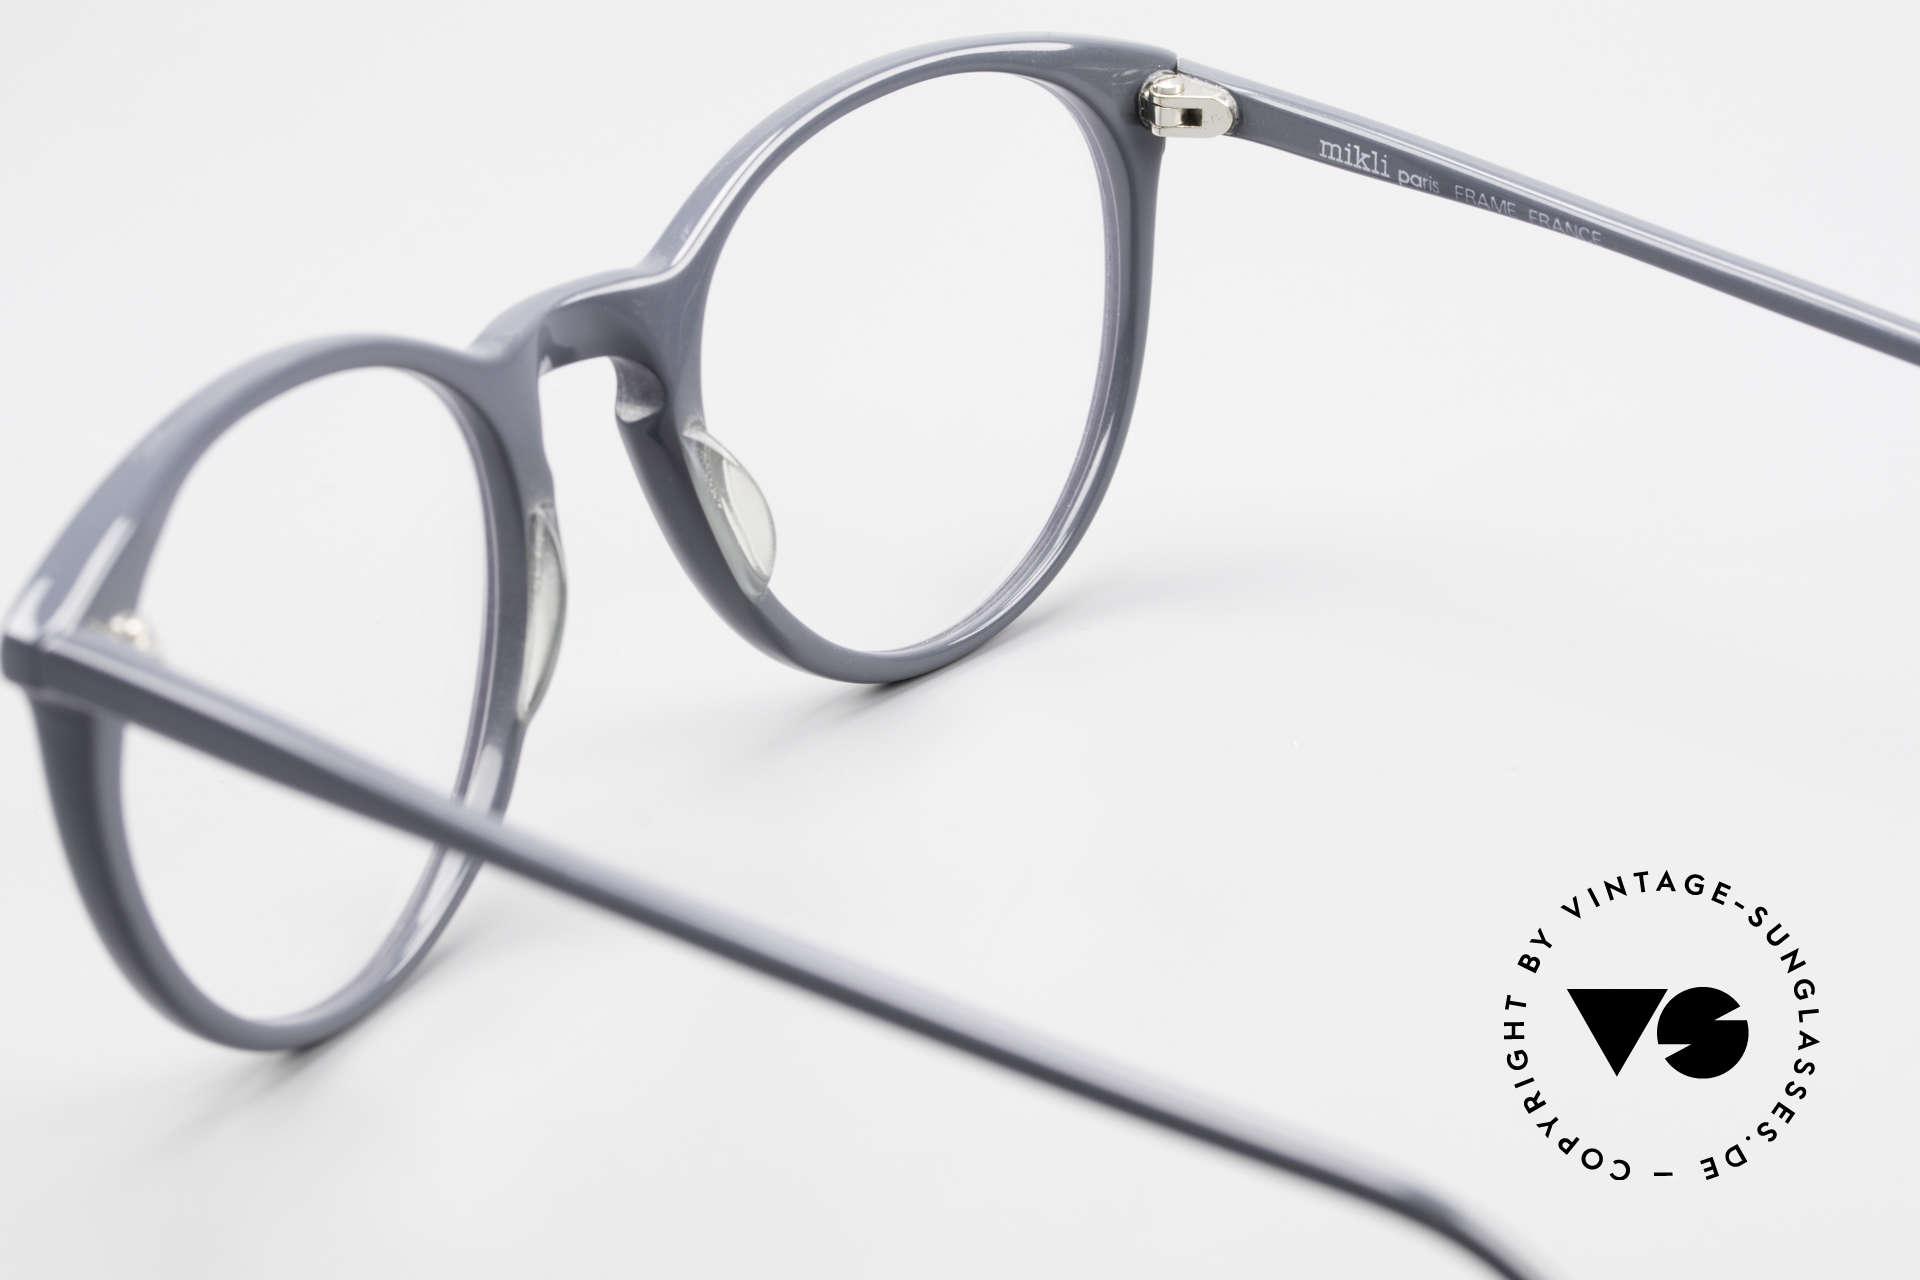 Alain Mikli 901 / 075 No Retro Glasses True Vintage, frame can be glazed with prescription (sun) lenses, Made for Men and Women